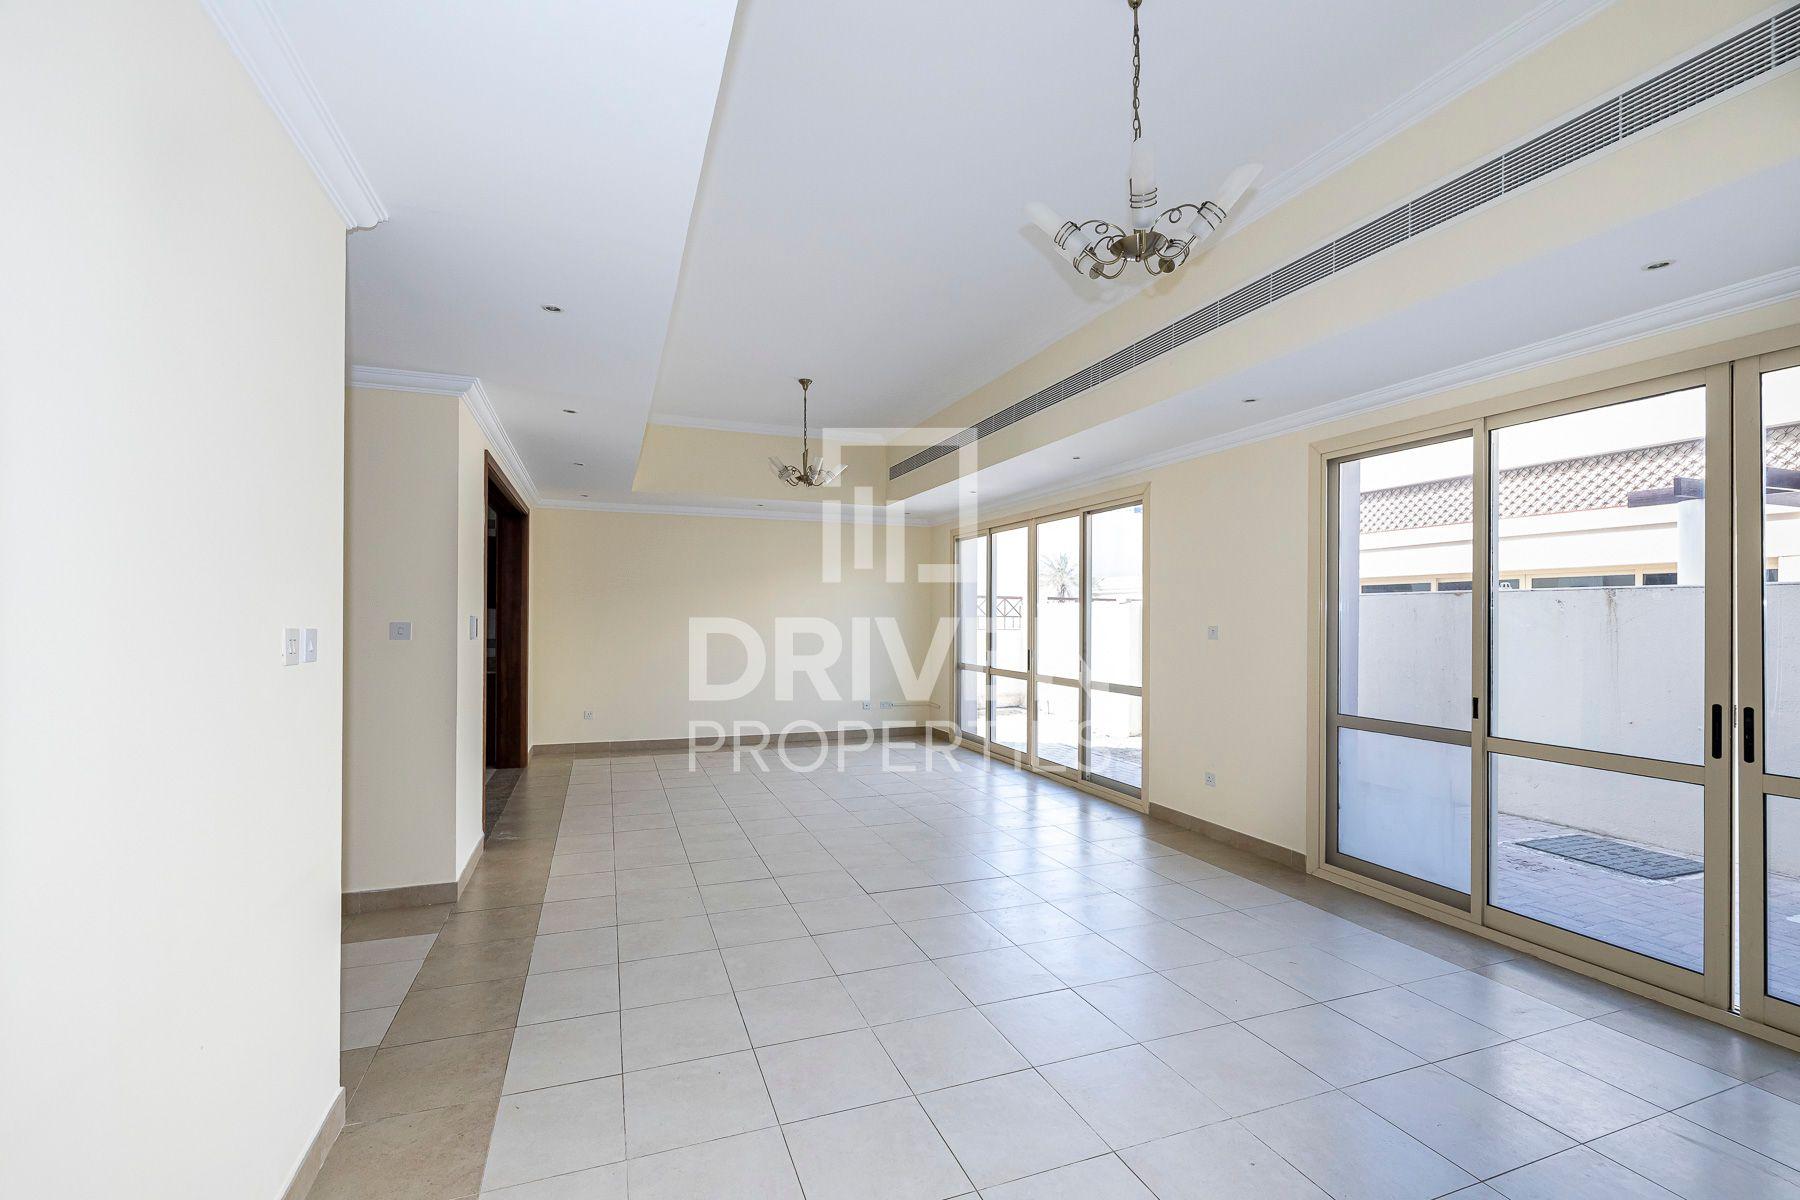 Villa for Rent in Bayti 33 - Al Barsha